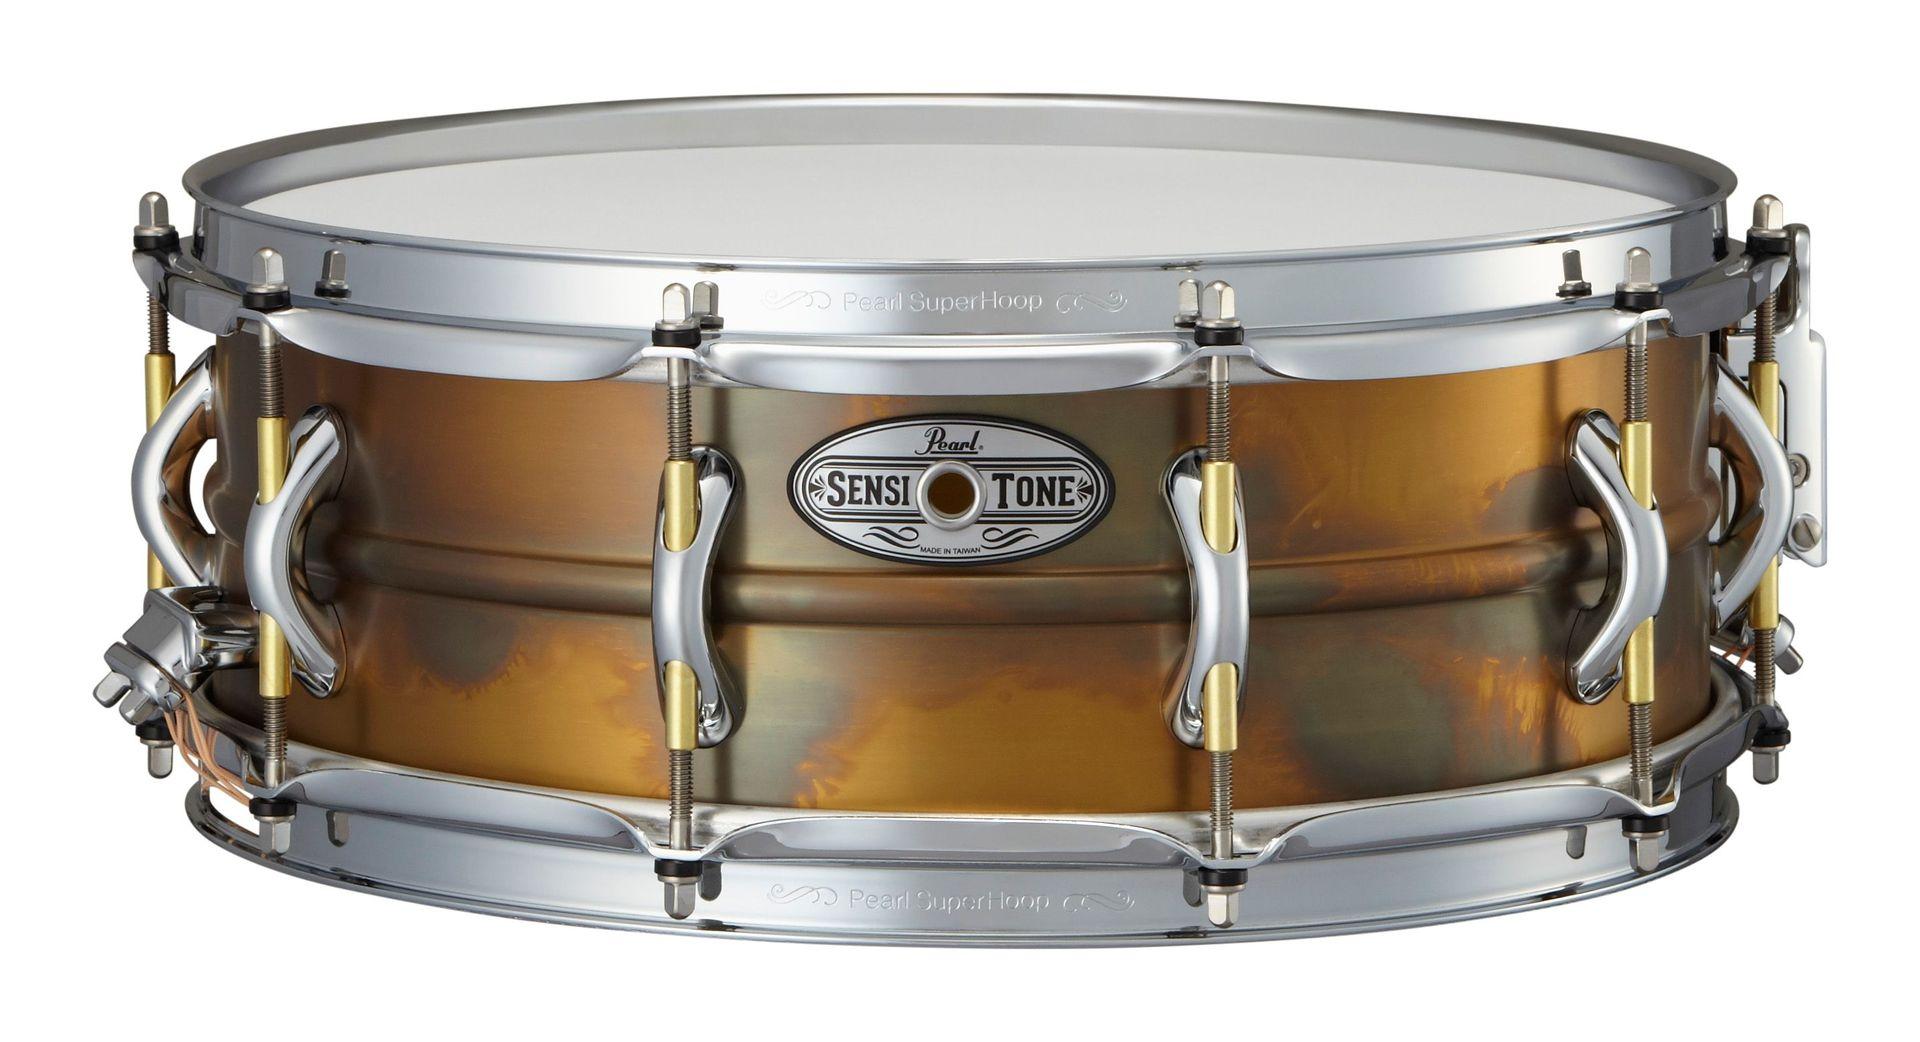 Pearl STA-1450FB Sensitone Premium Snare beaded brass Messing